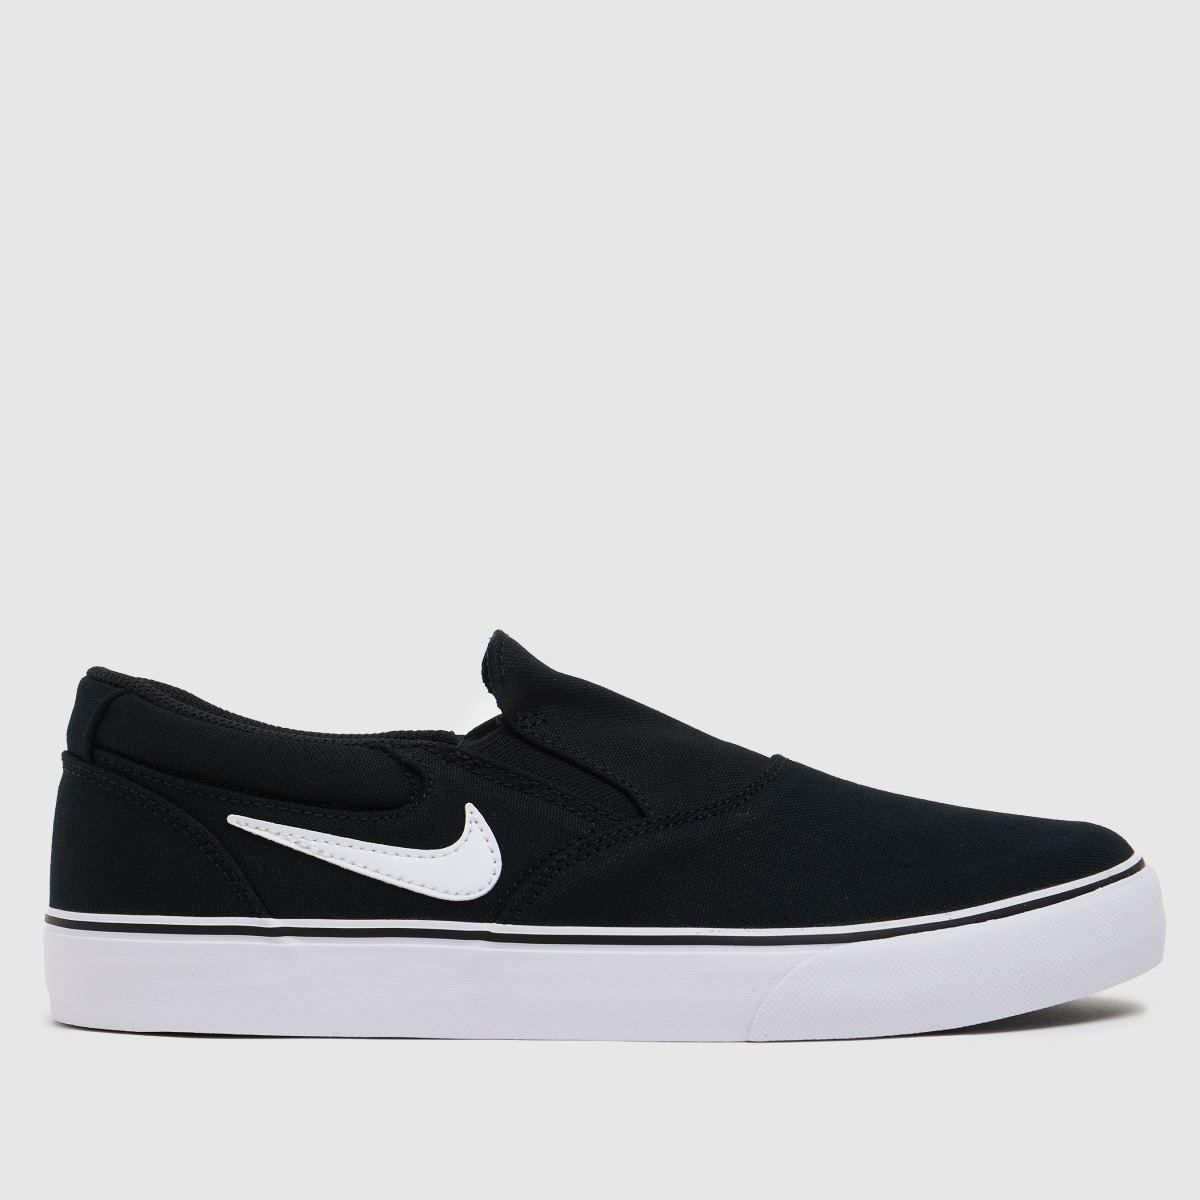 Nike SB Black & White Chron 2 Slip Trainers